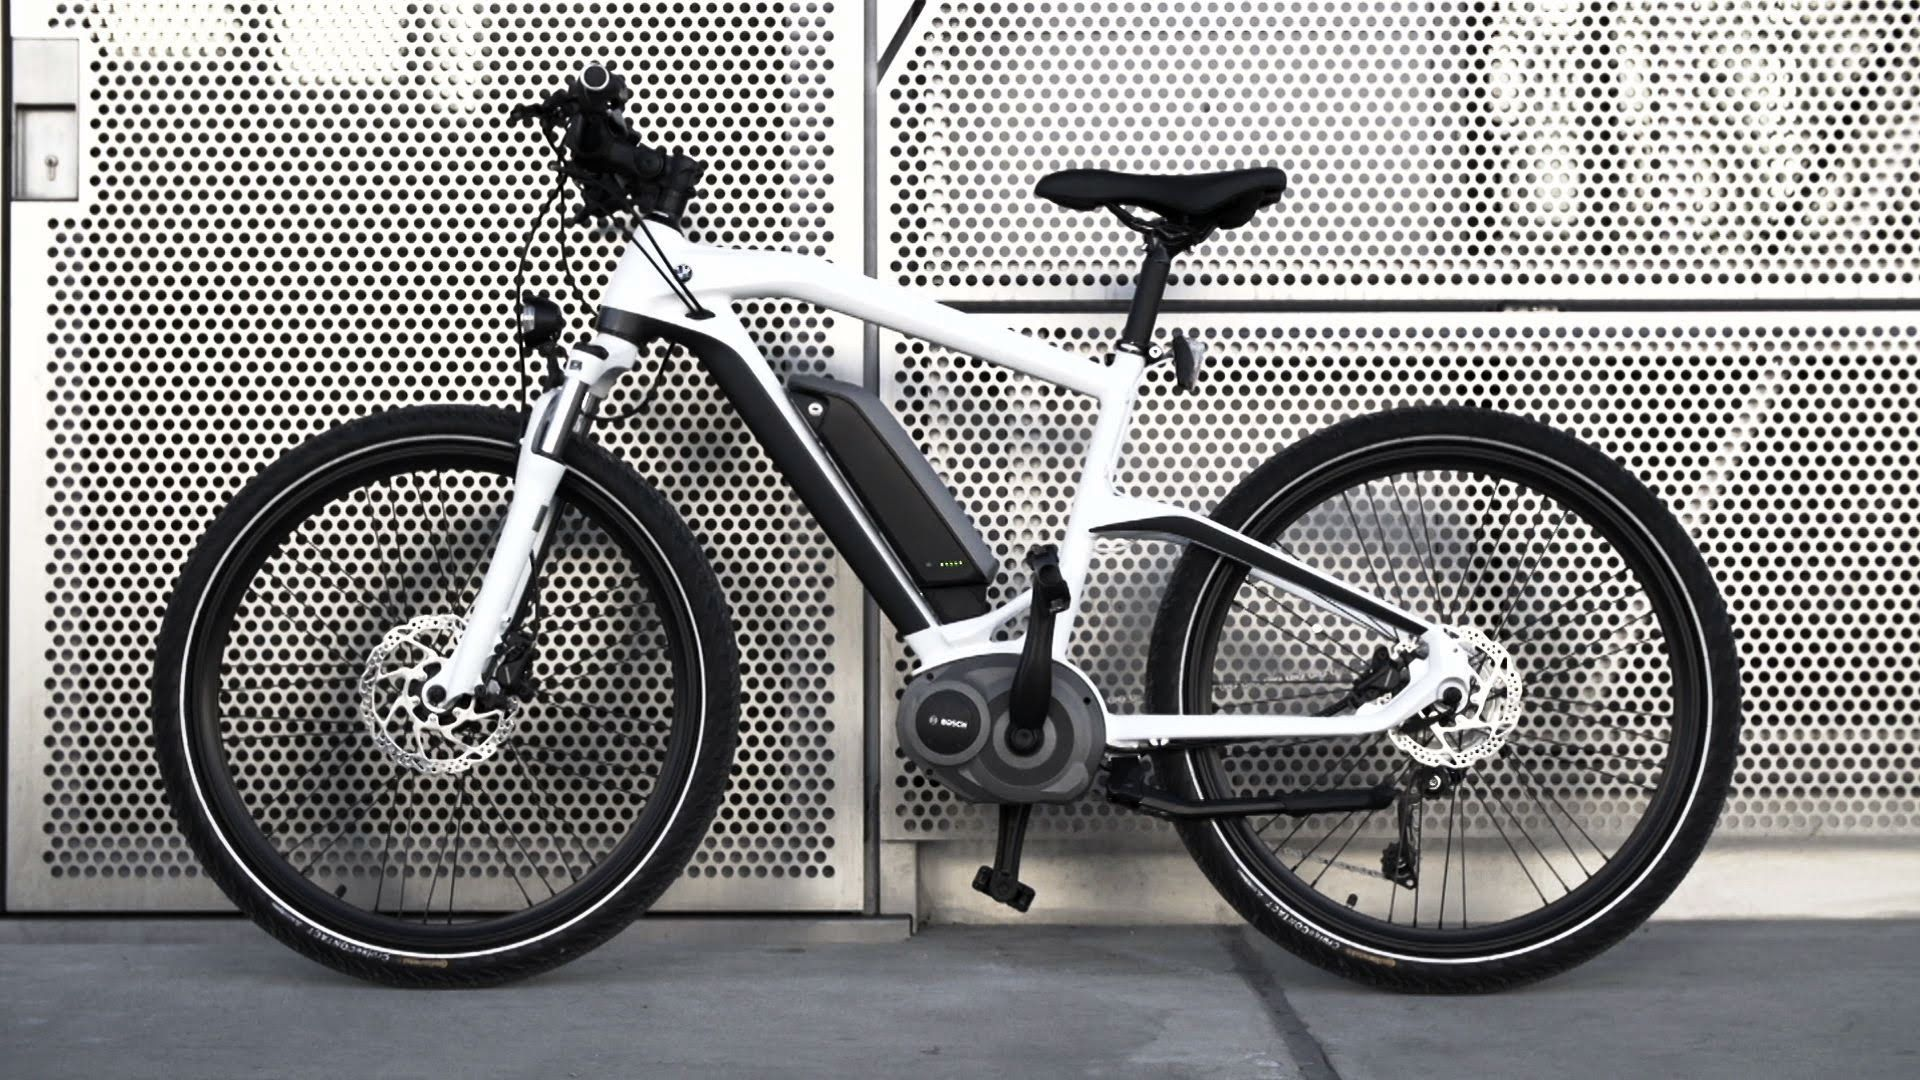 generation e bike das erste bmw cruise e bike bmw. Black Bedroom Furniture Sets. Home Design Ideas